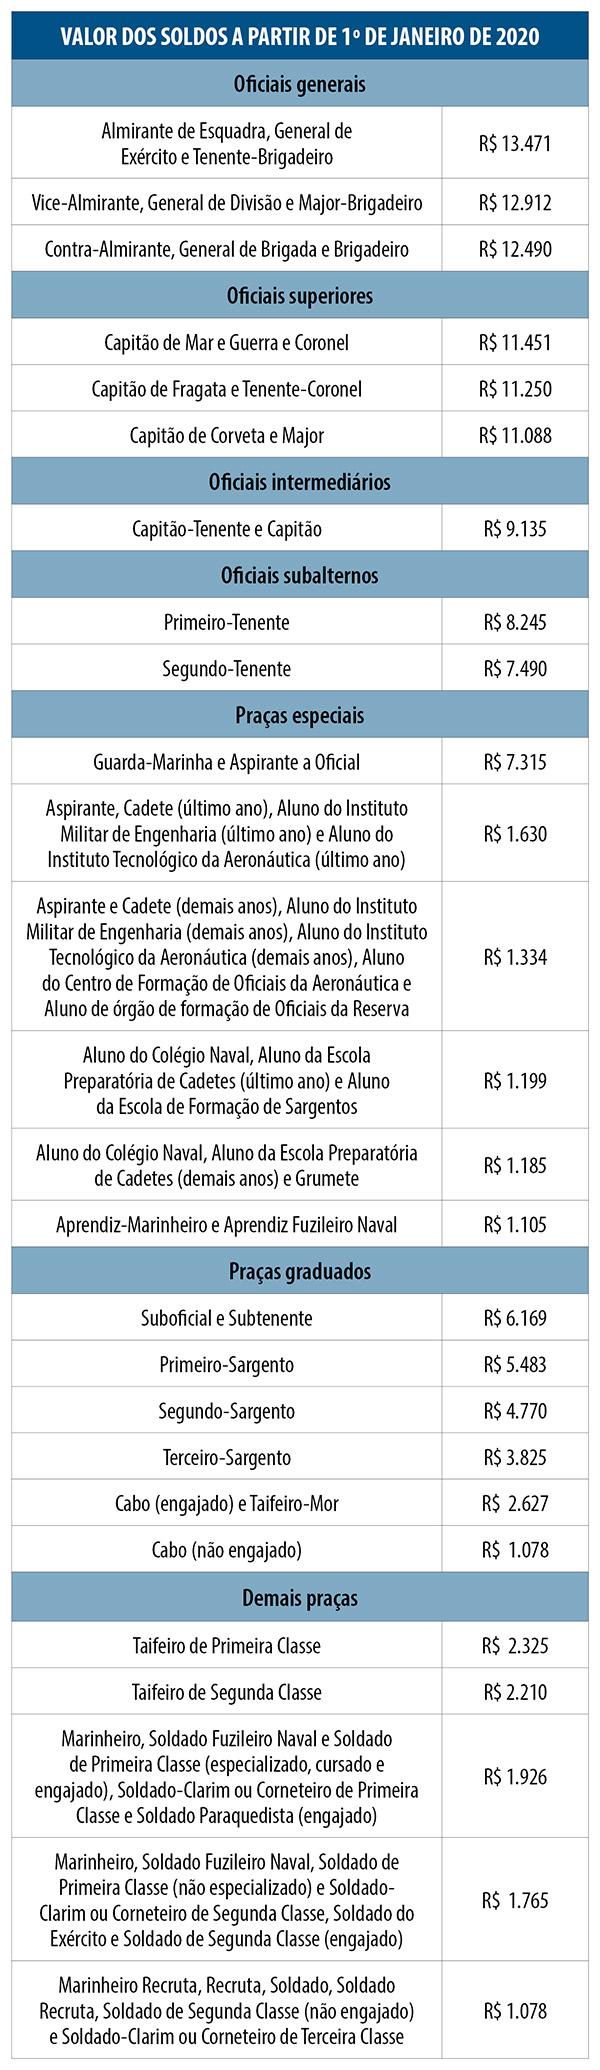 tabela-gratificacoes-2